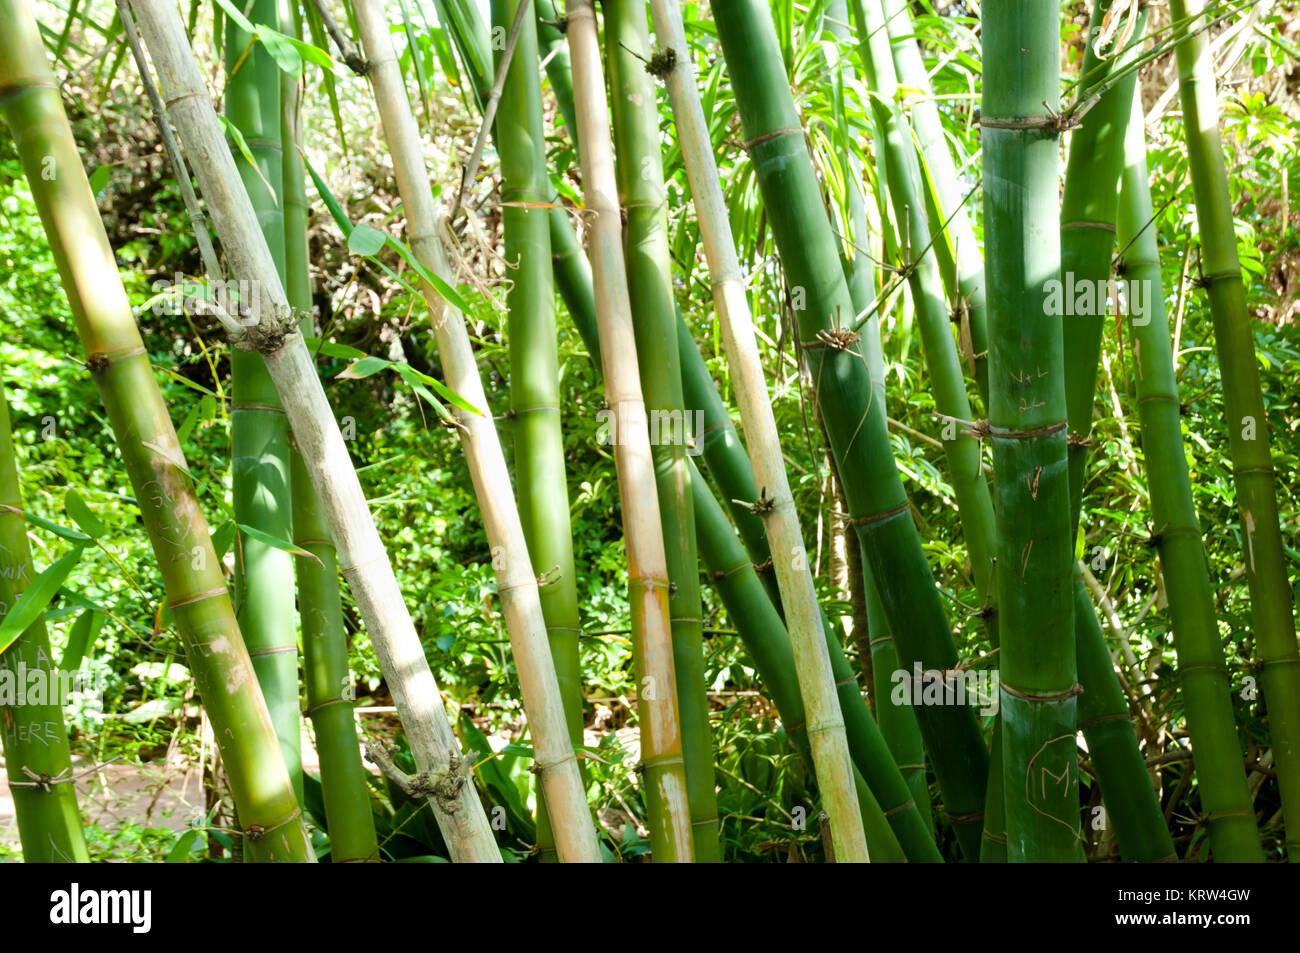 Palos De Bambu Bosque Foto Imagen De Stock 169582809 Alamy - Palos-de-bambu